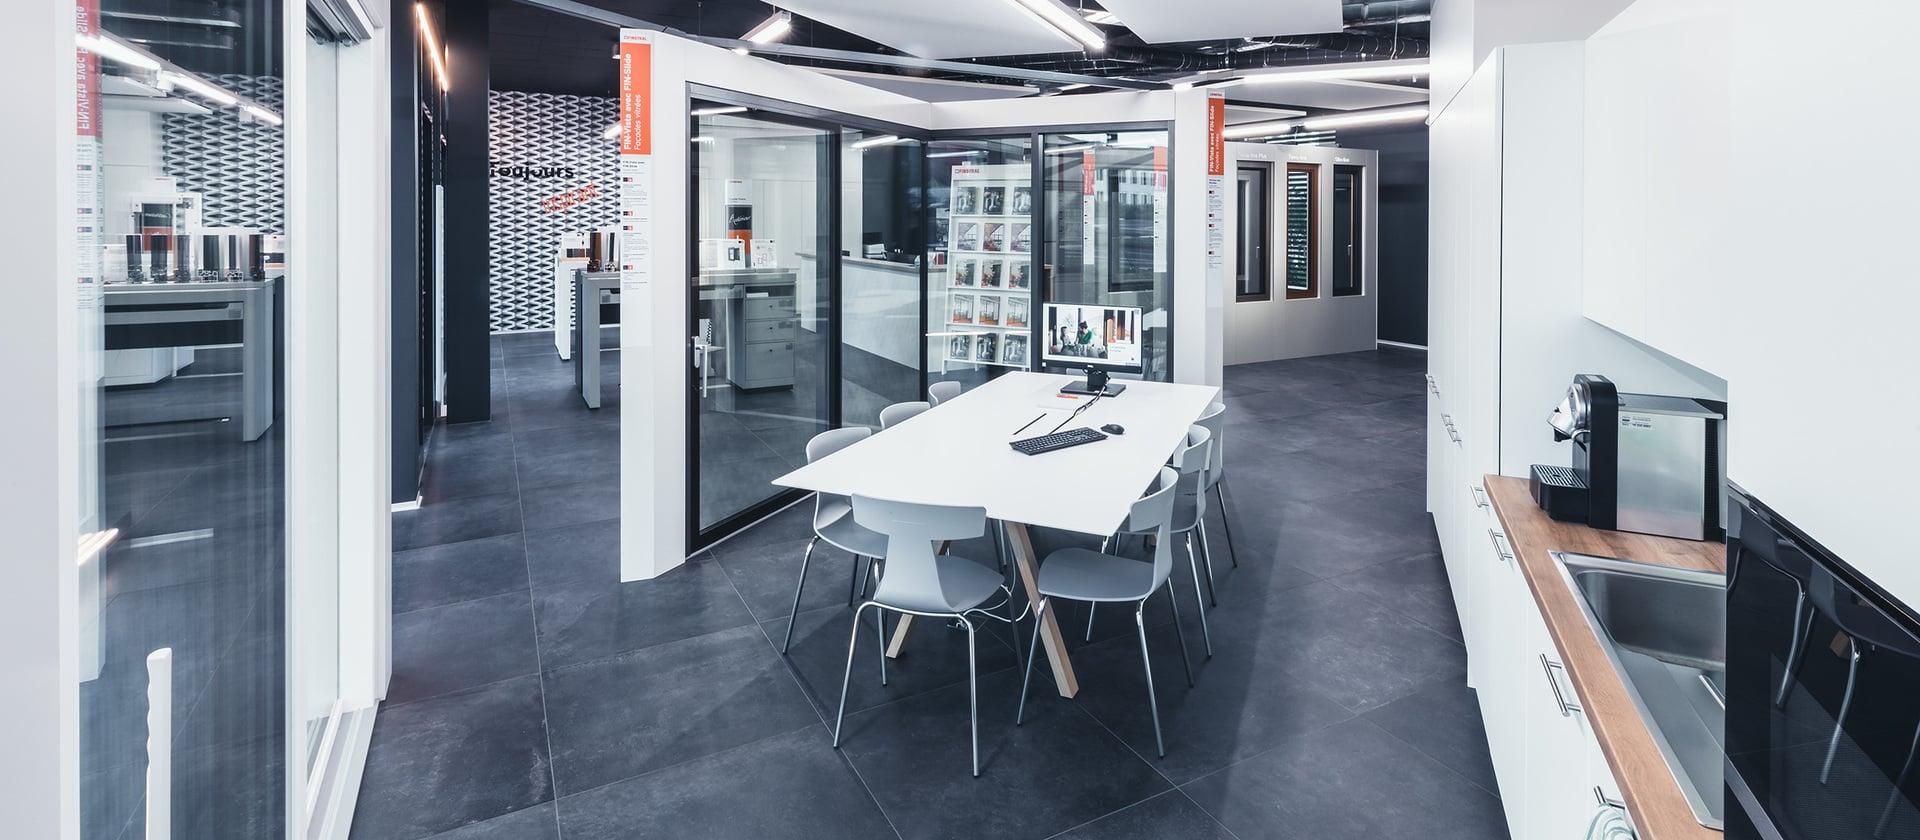 Finstral Studio Crissier